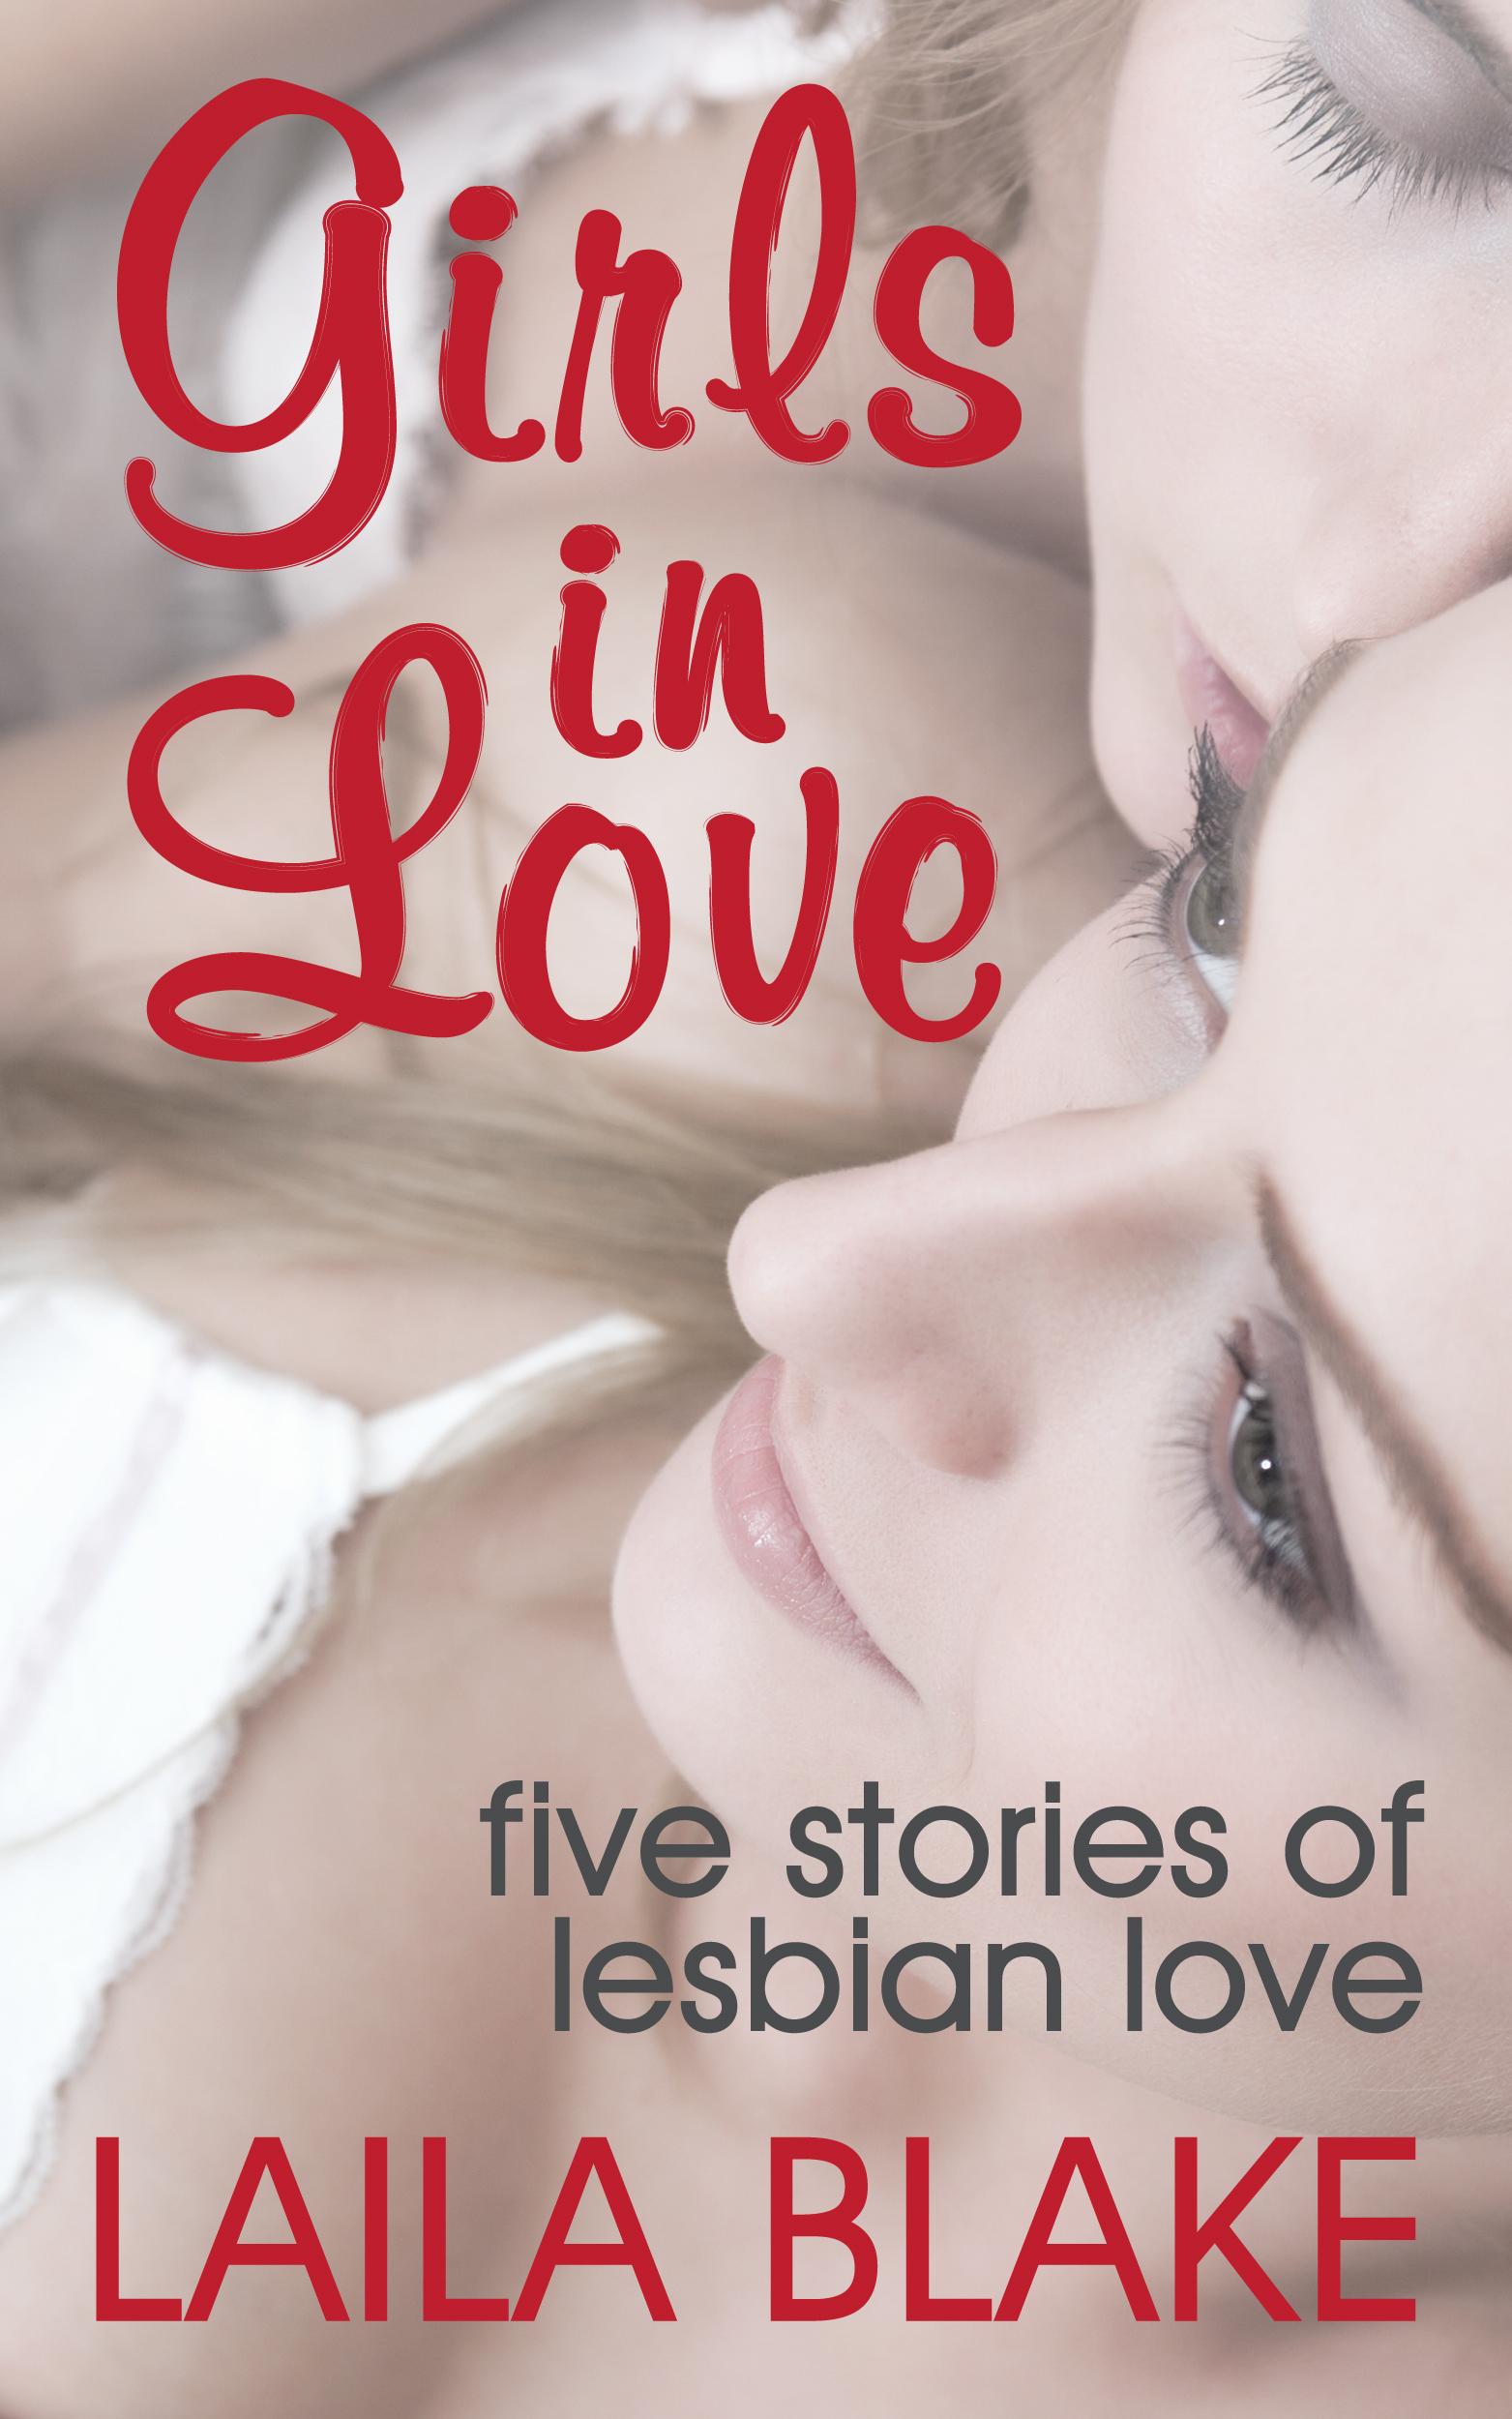 Смотреть онлайн lesbian love stories 24 фотография